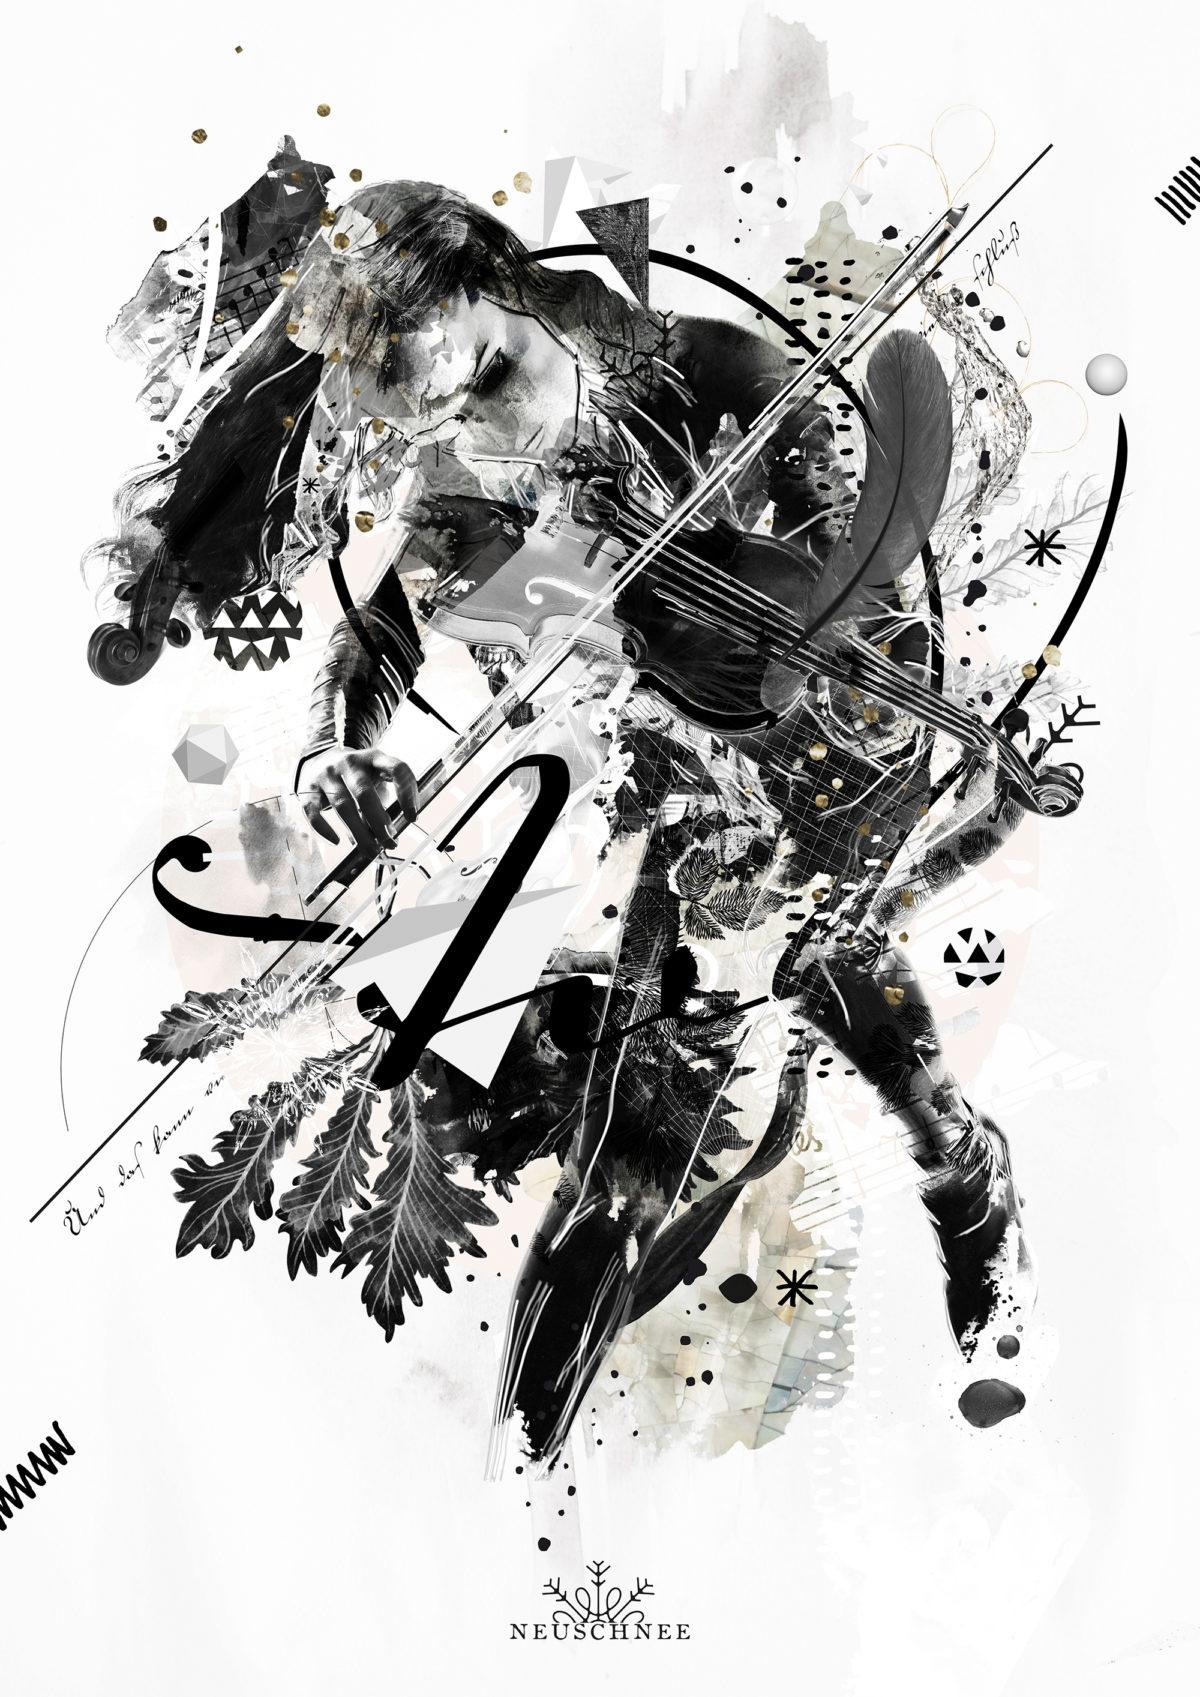 neuschnee_artwork_01